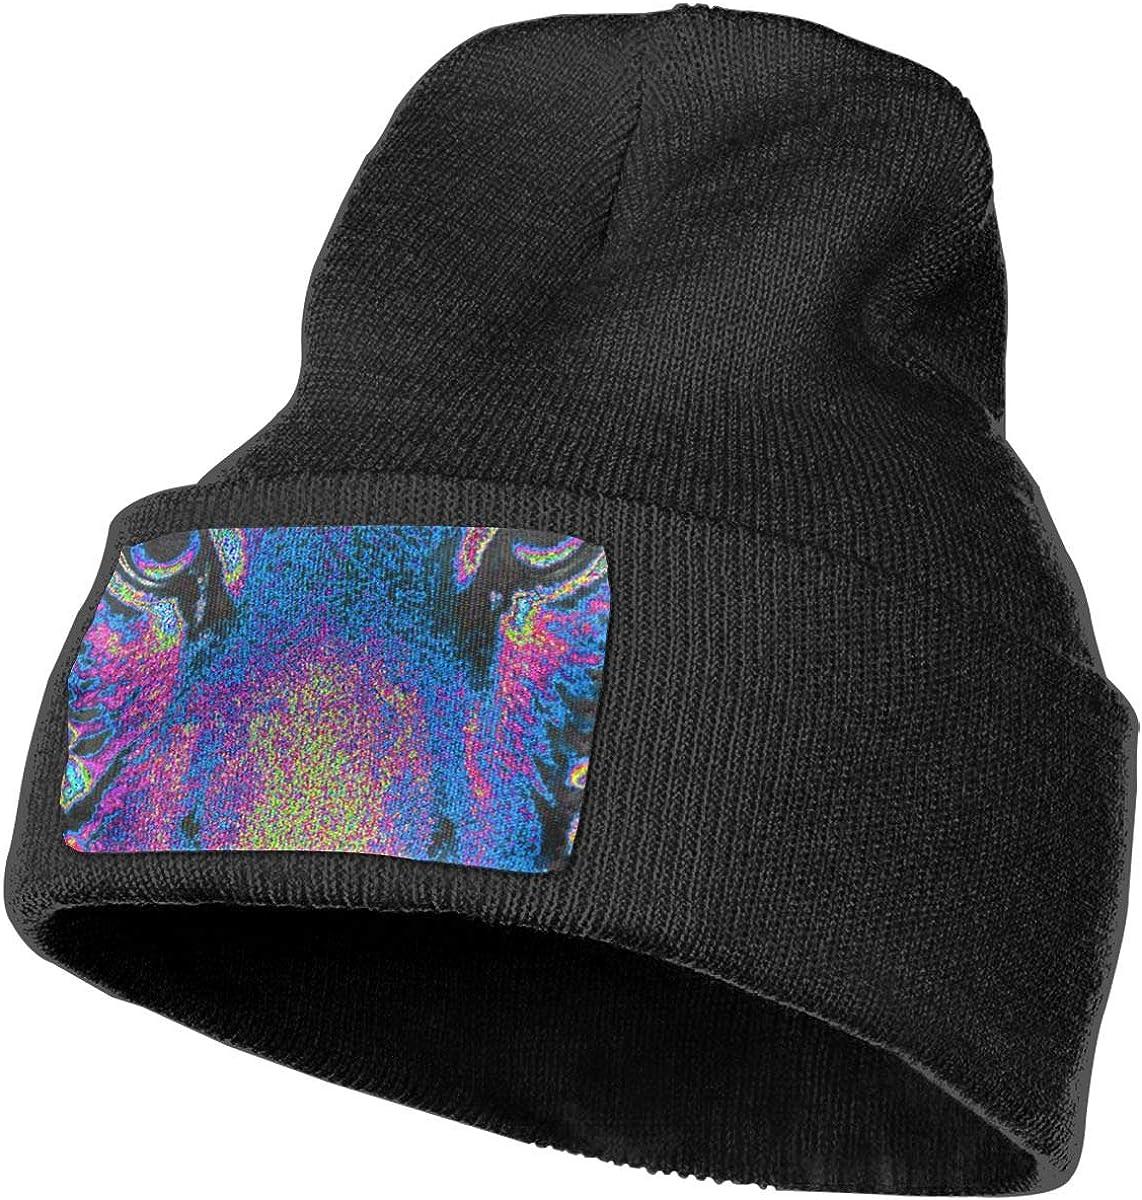 100/% Acrylic Acid Mas Beanie Hat Ruin Tiger Fashion Knitting Hat for Men Women